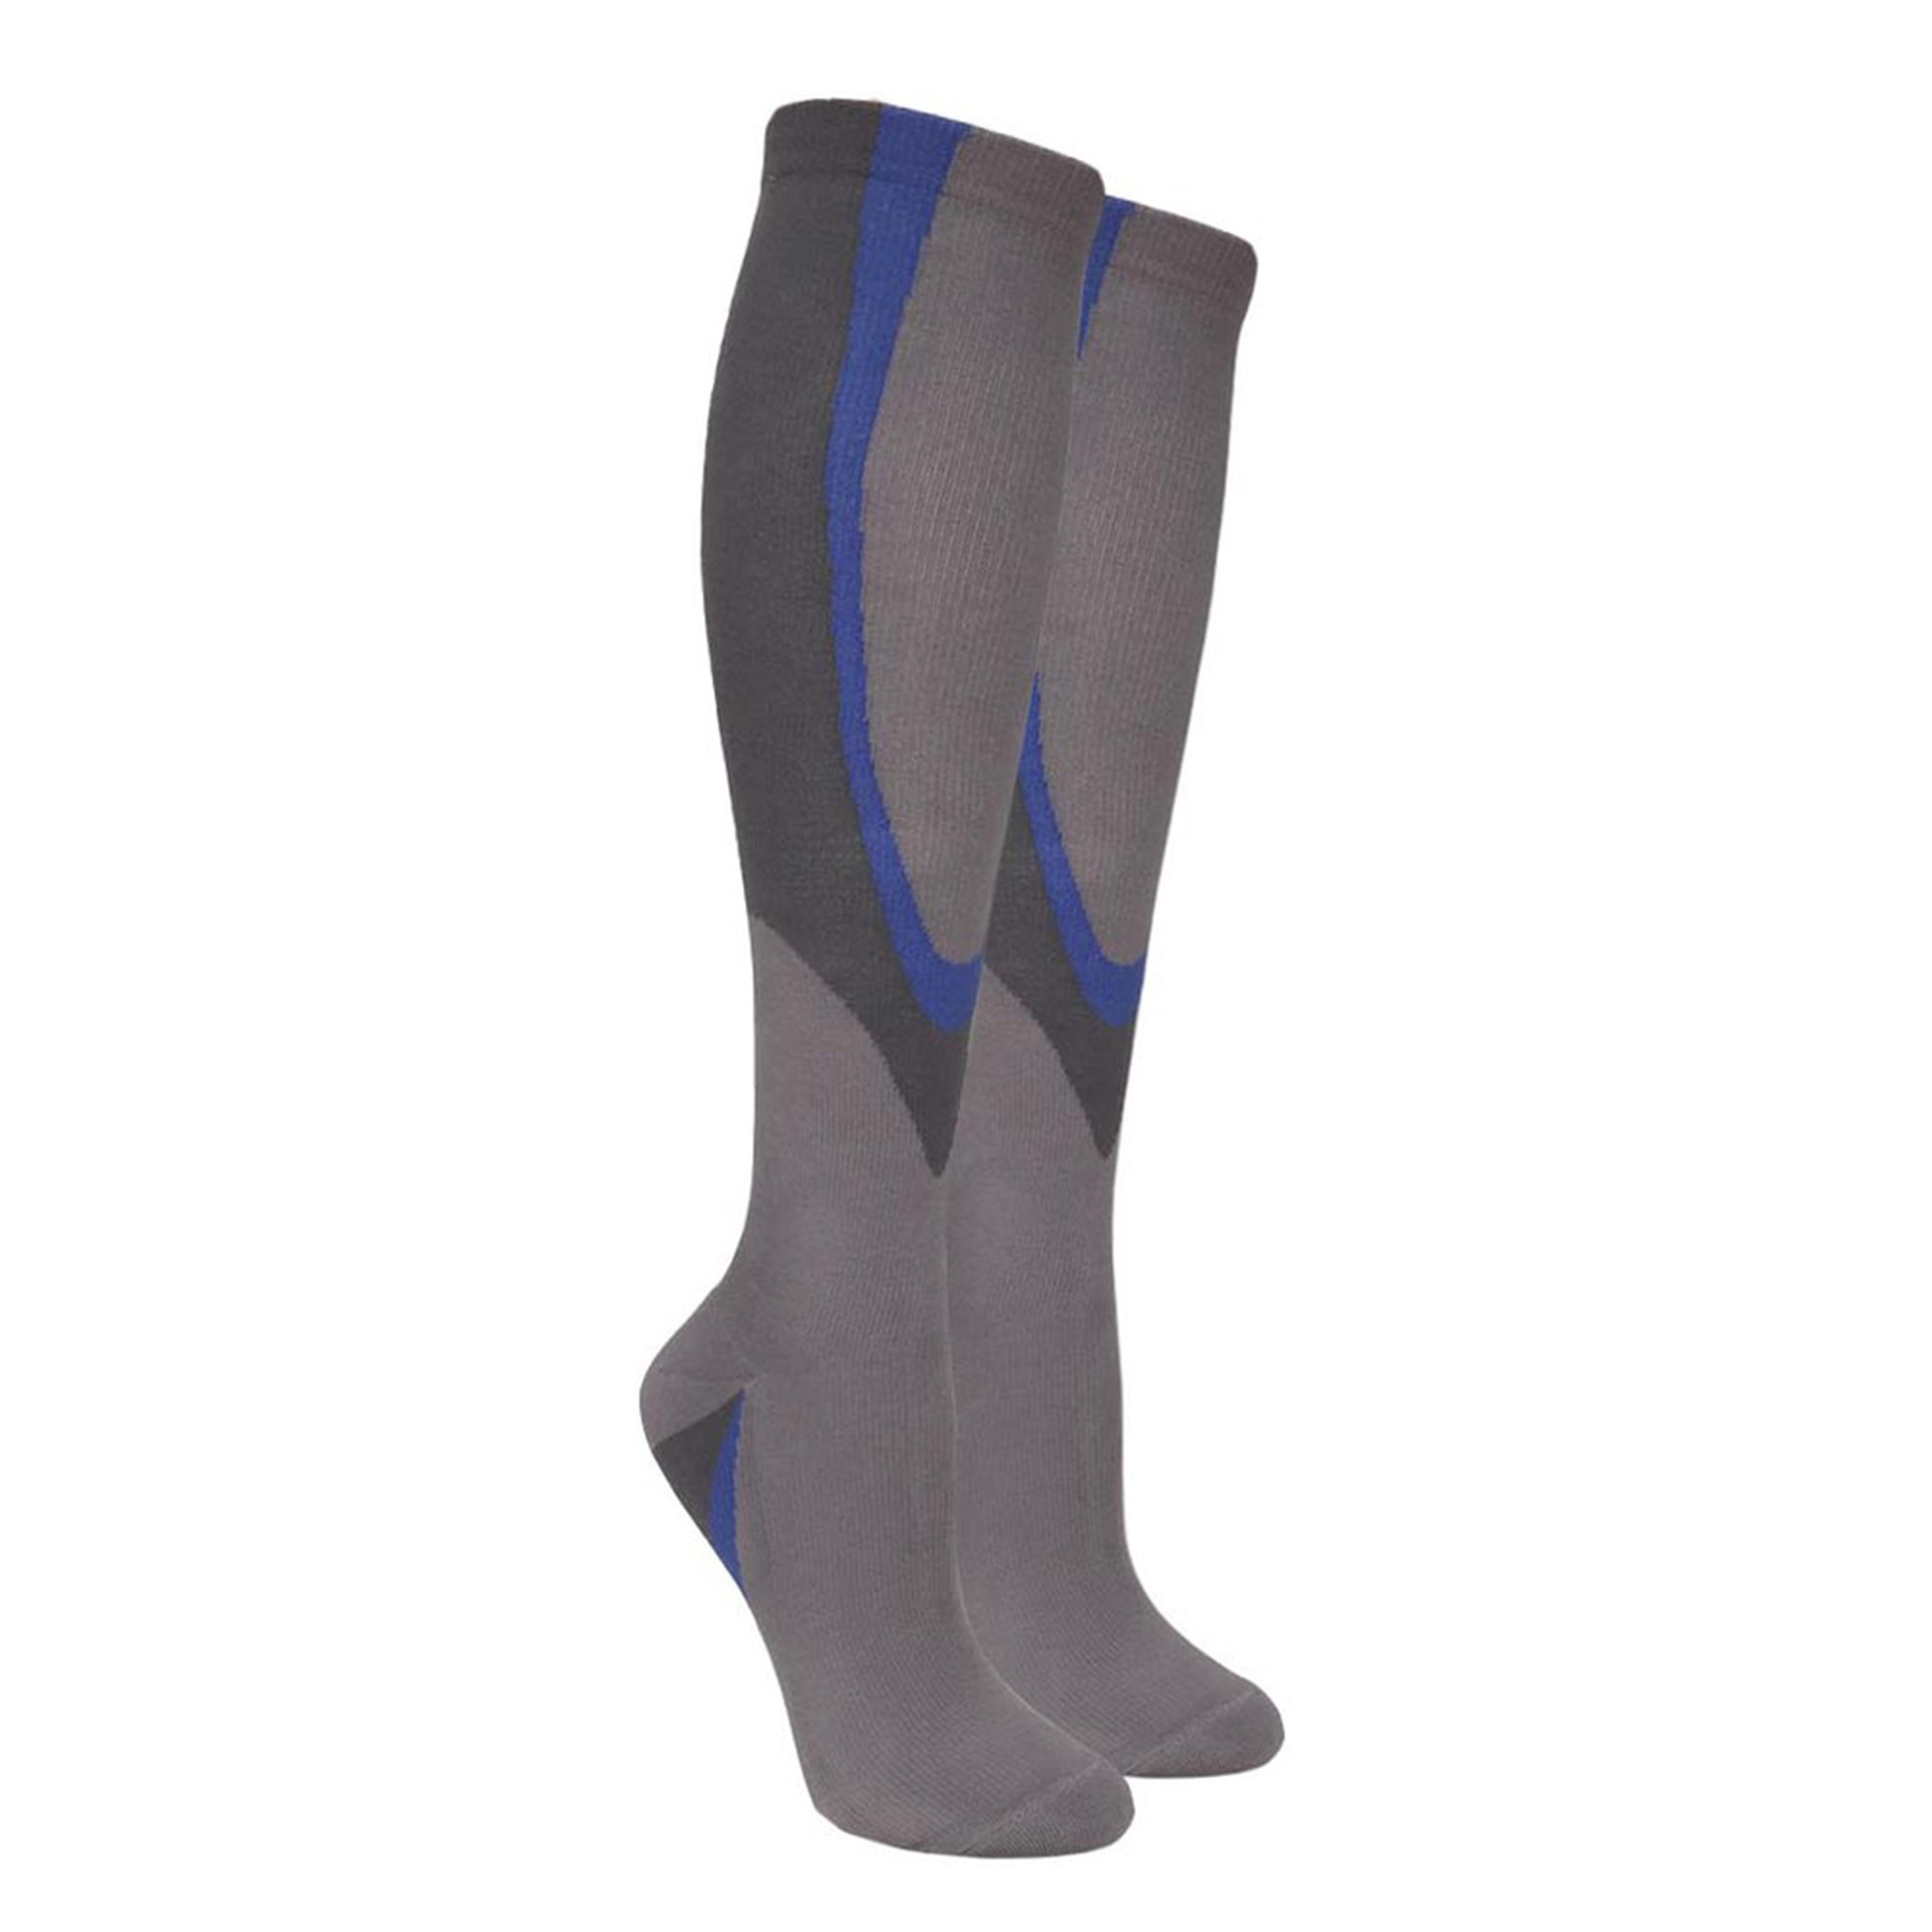 CERBERUS Strength Deadlift Socks Many Colours Available! Premium Quality